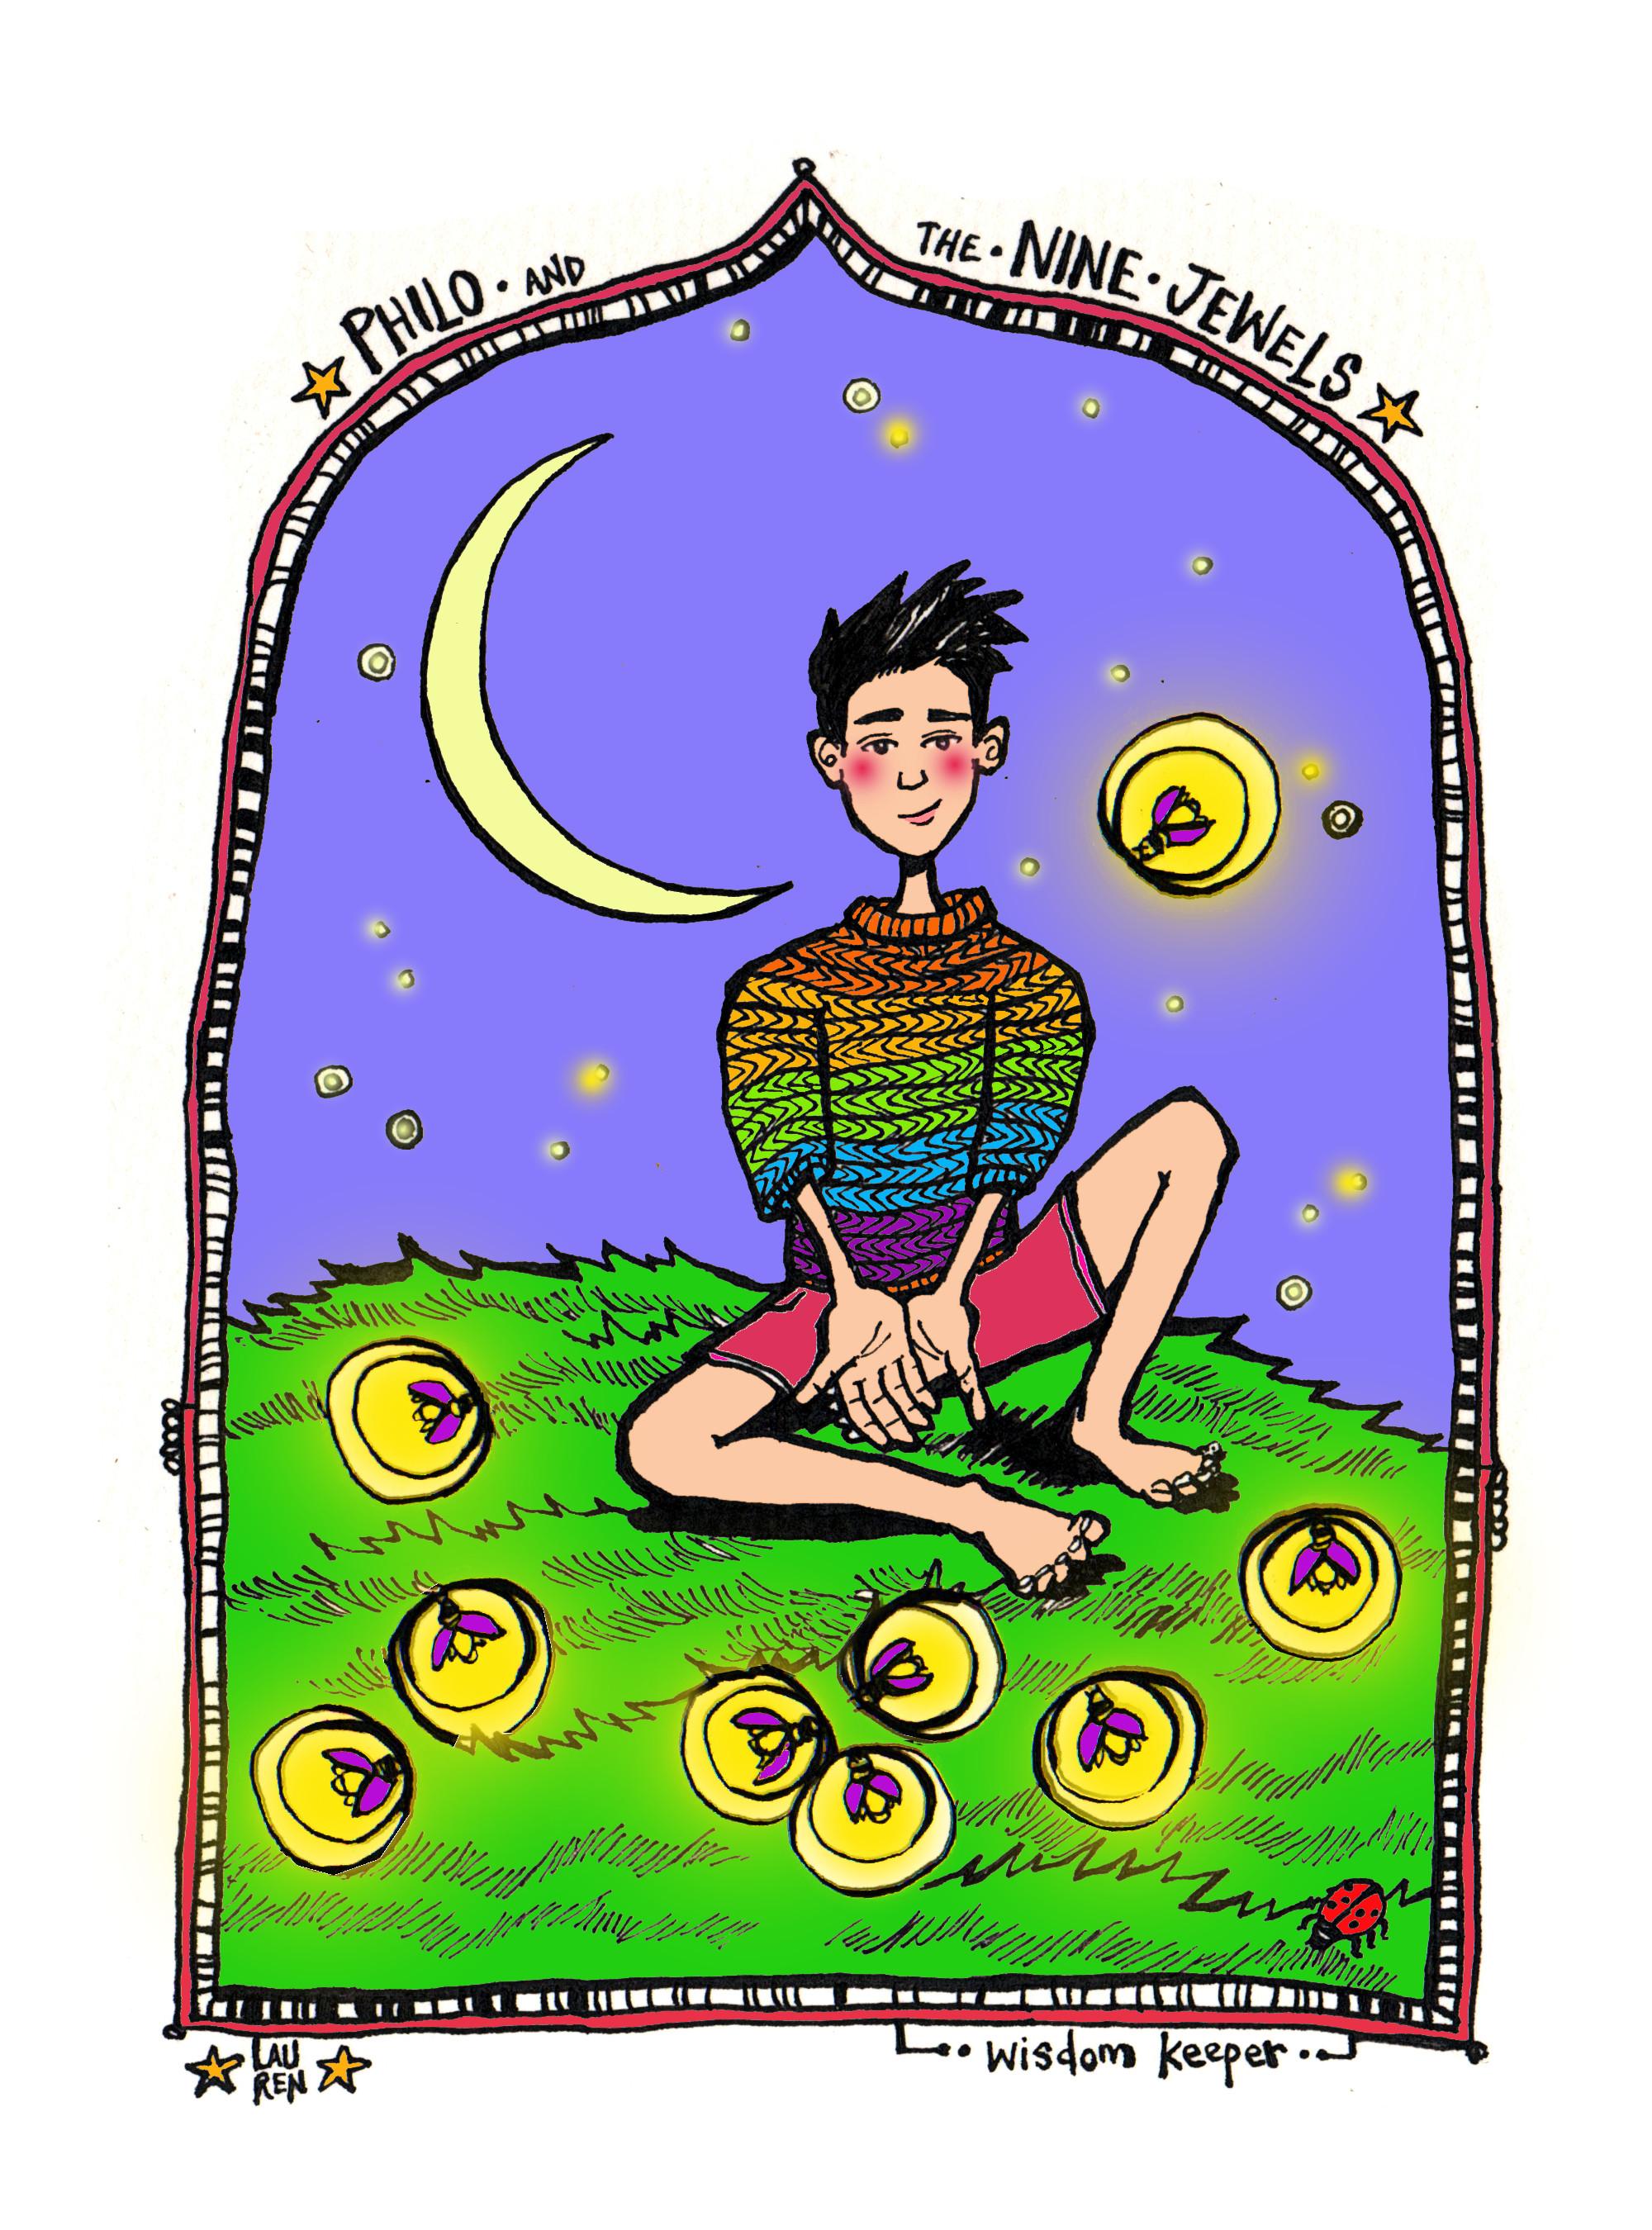 Philo the Wisdom Keeper (colourway)